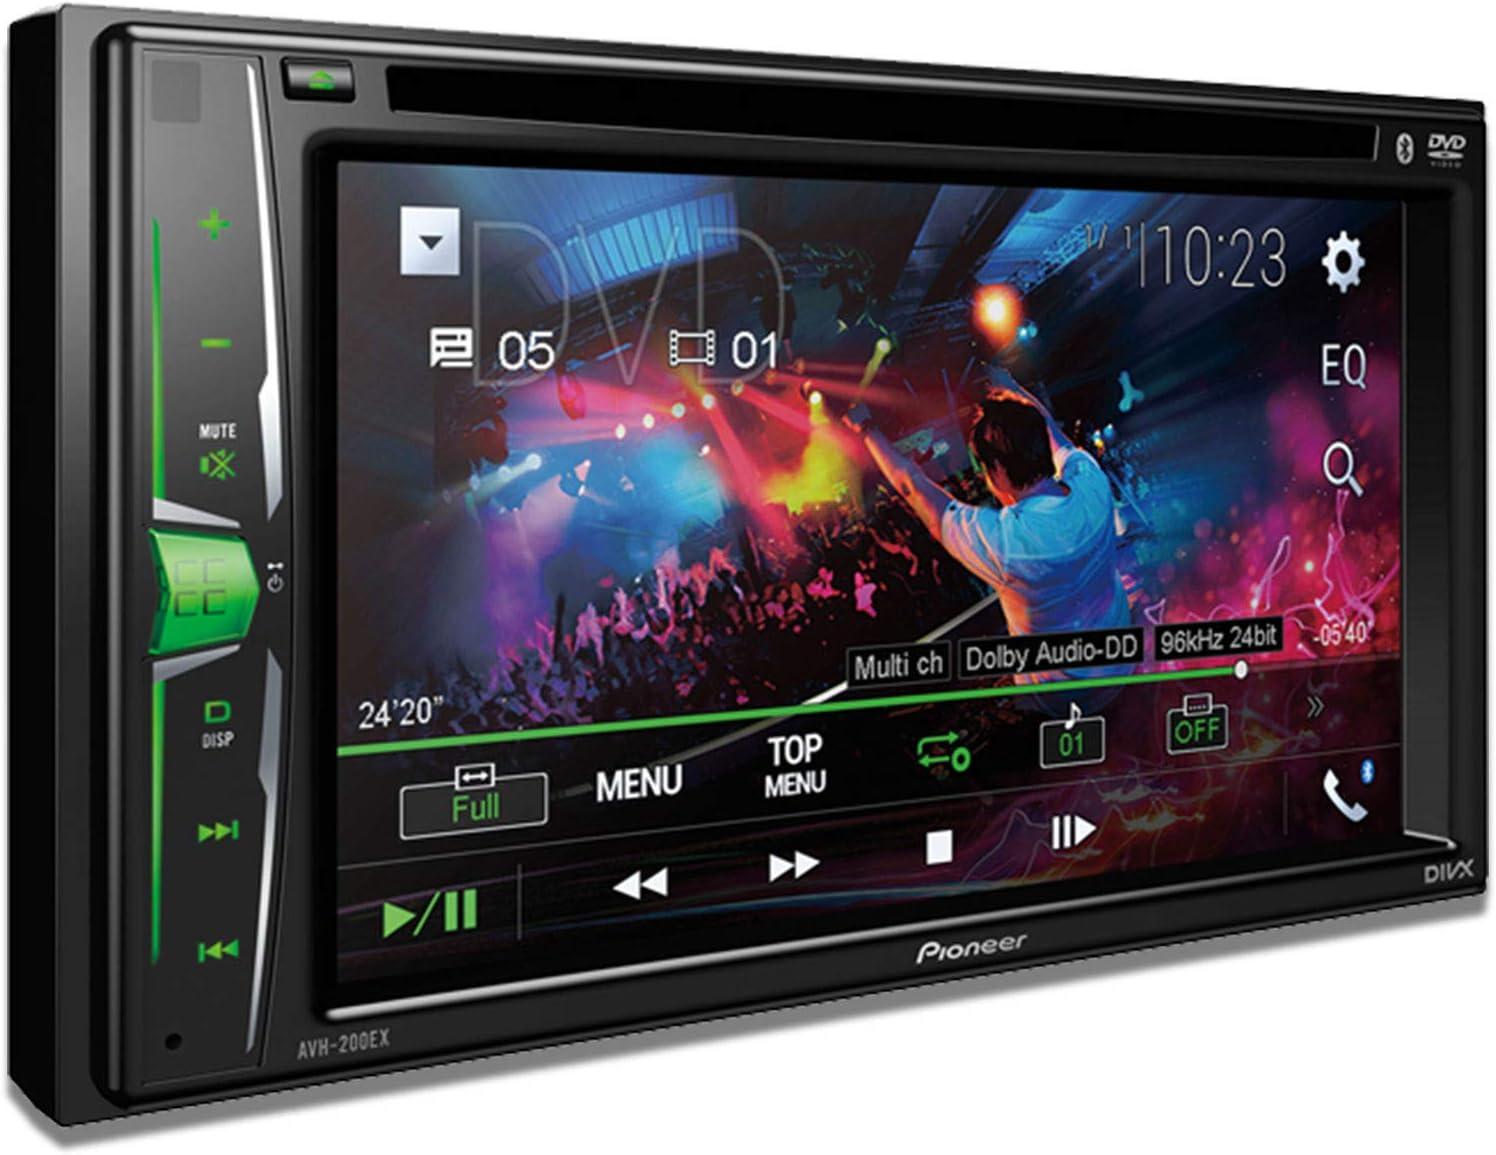 Pioneer AVH-200EX Multimedia DVD Receiver